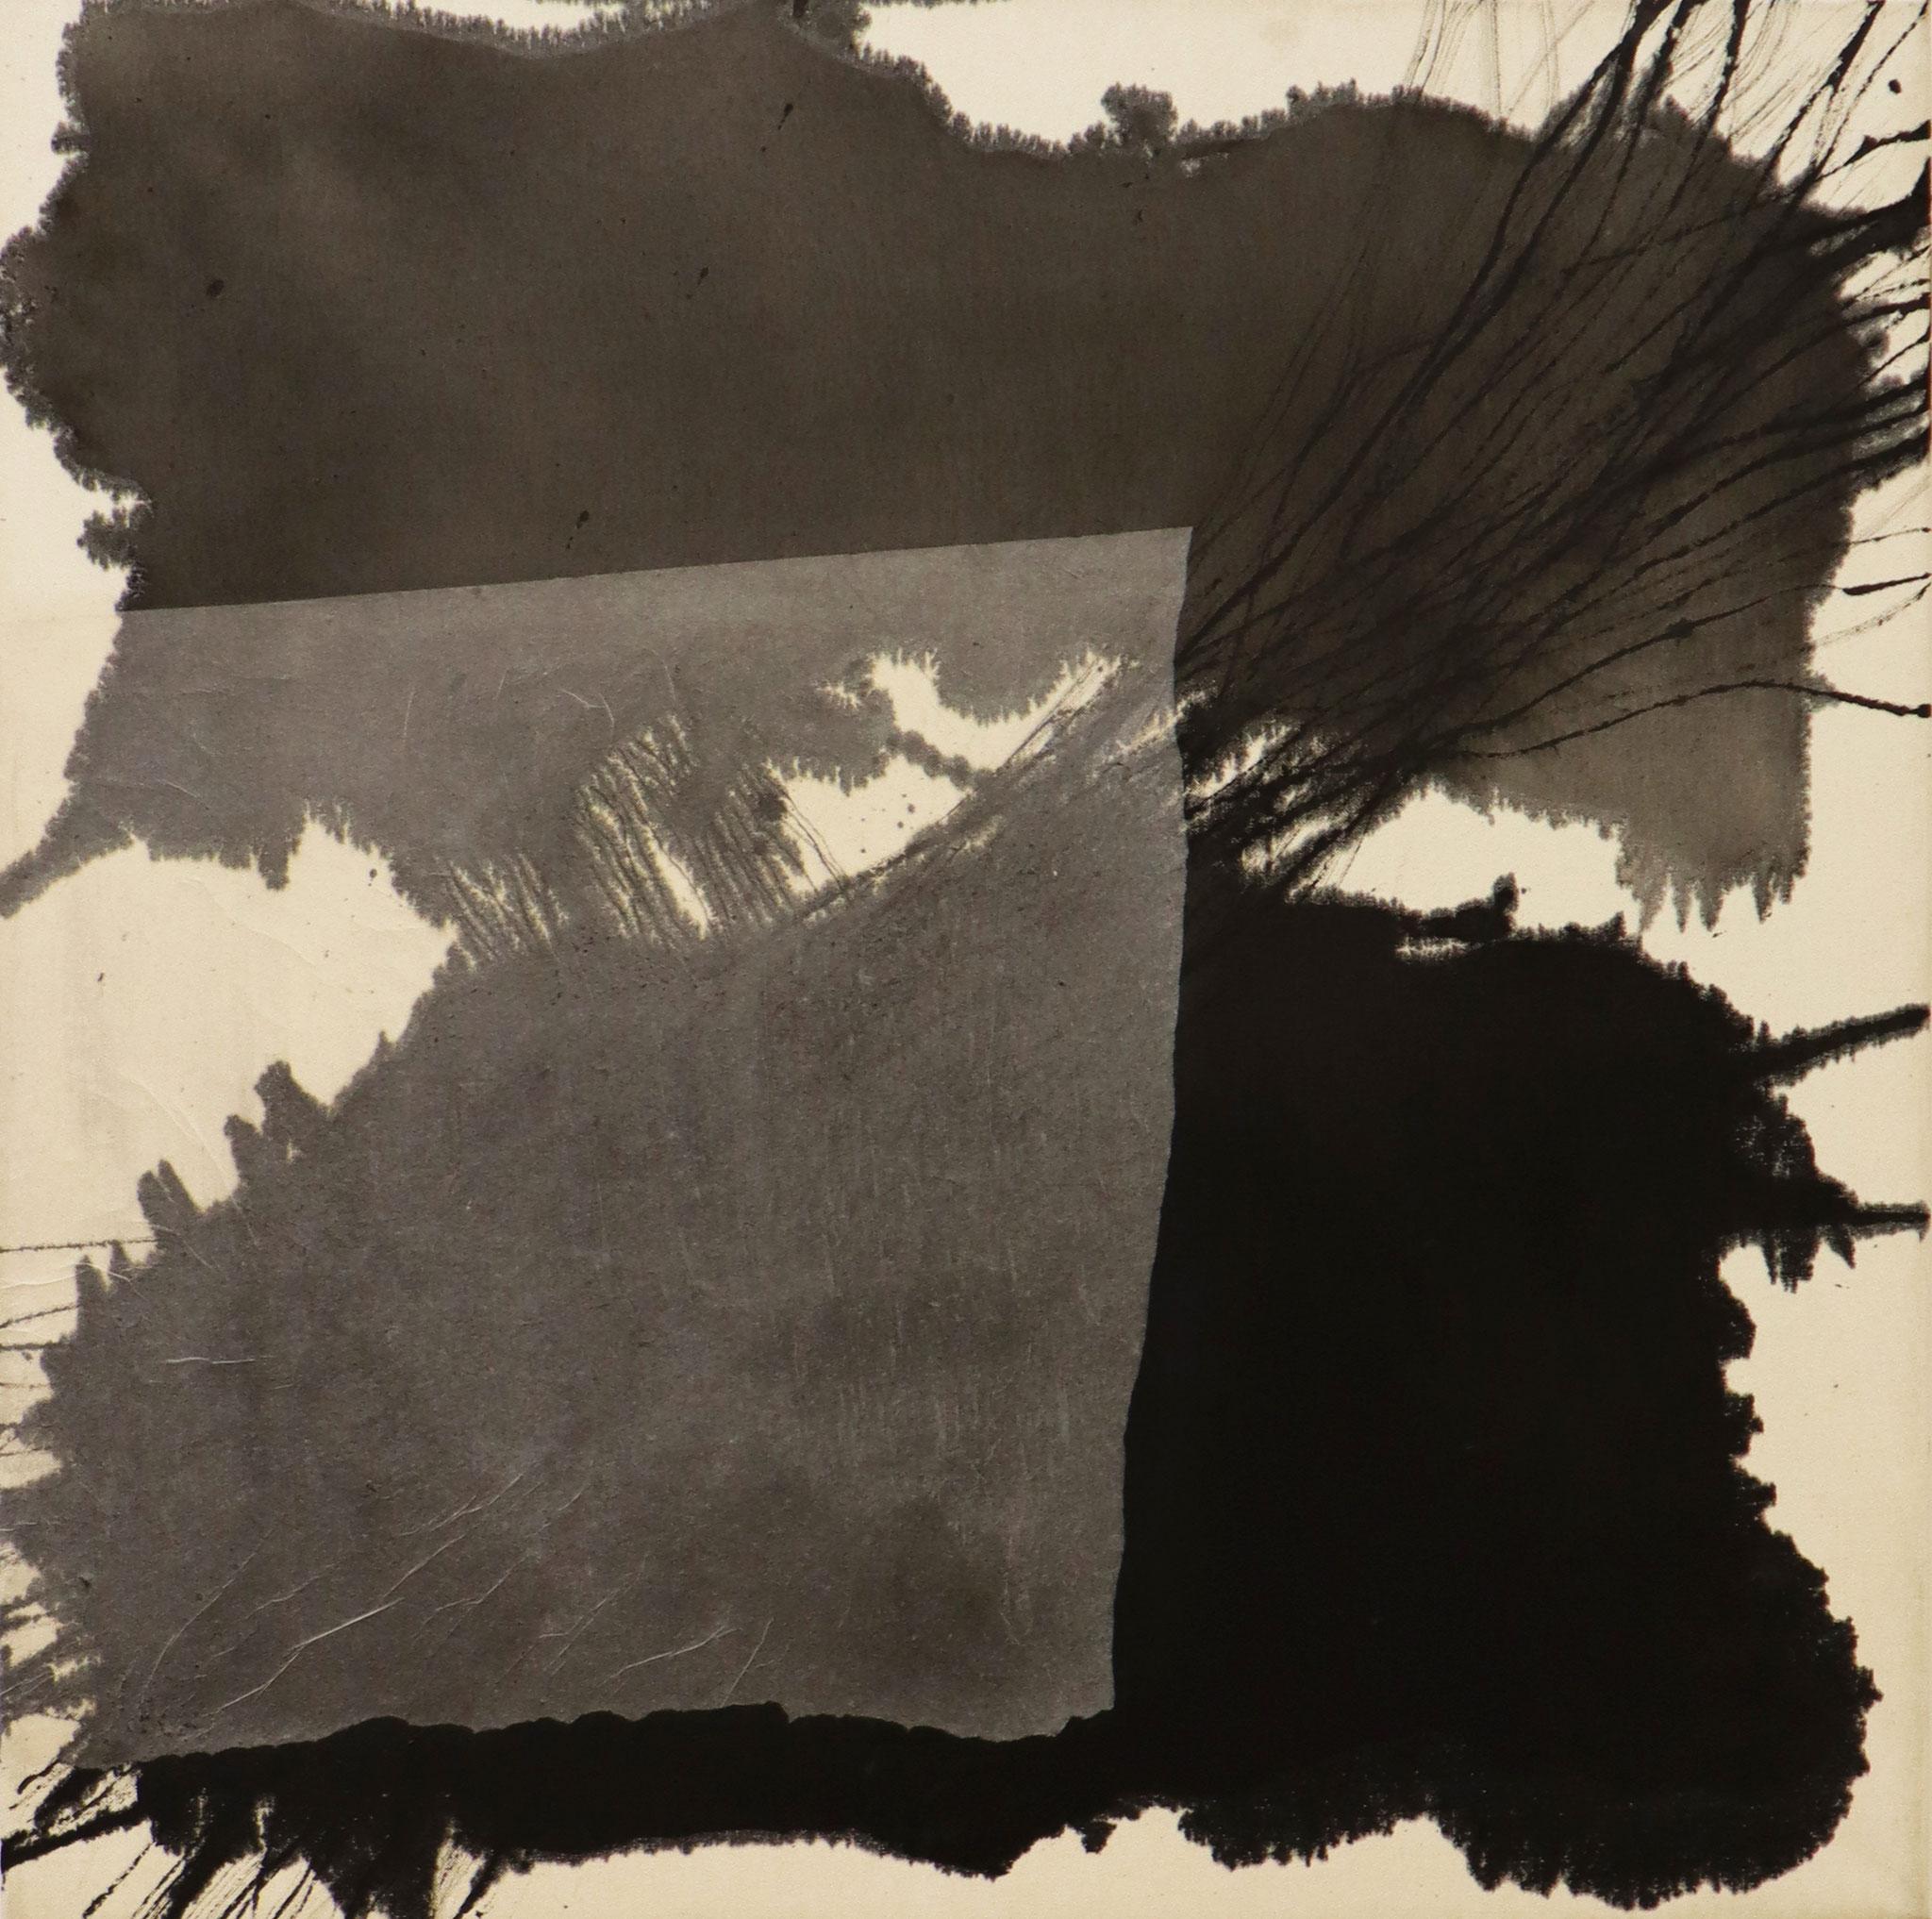 Series 'Traces' 2020 - Tusche & Seidenpapier auf Leinwand / ink & silk paper on canvas - 80 x 80 x 3.6 cm